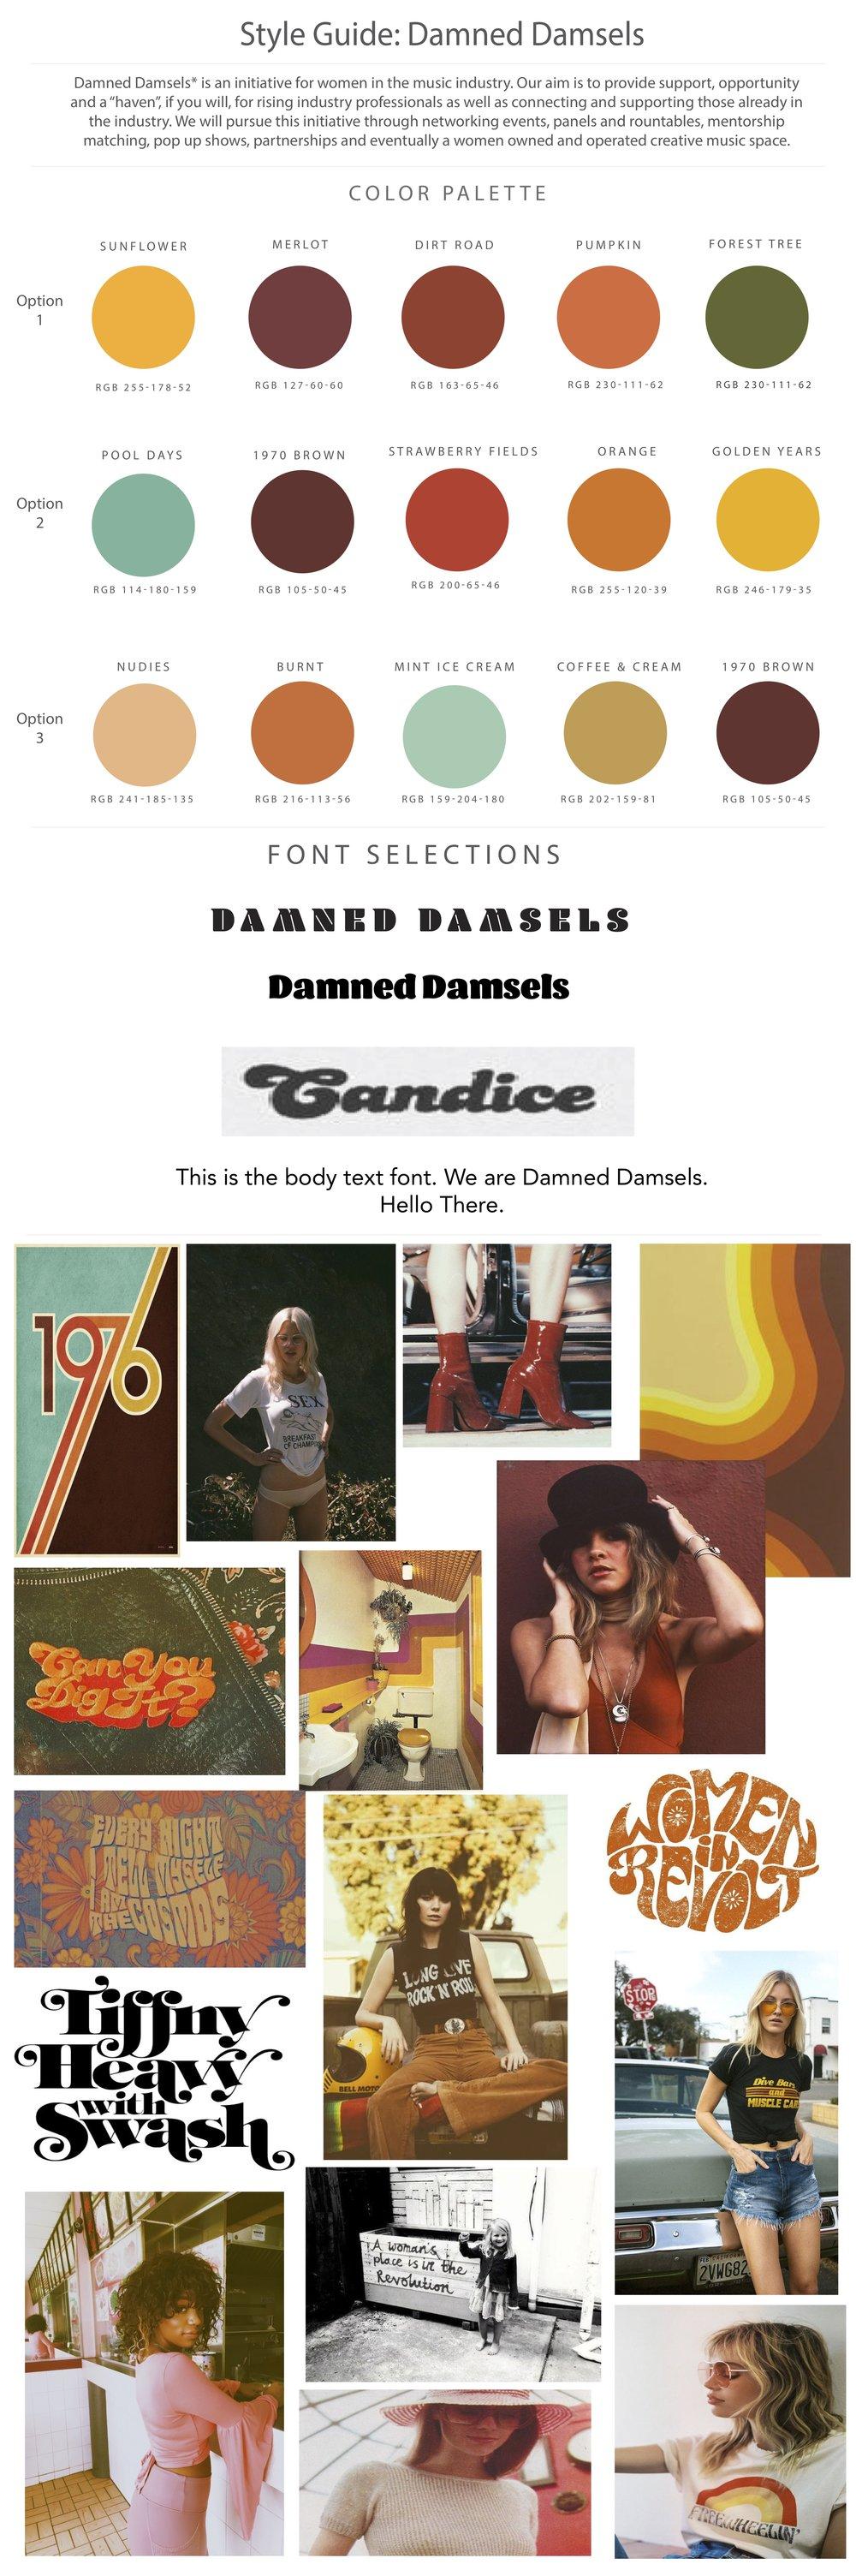 DamnedDamsels_SG(Revised).jpg